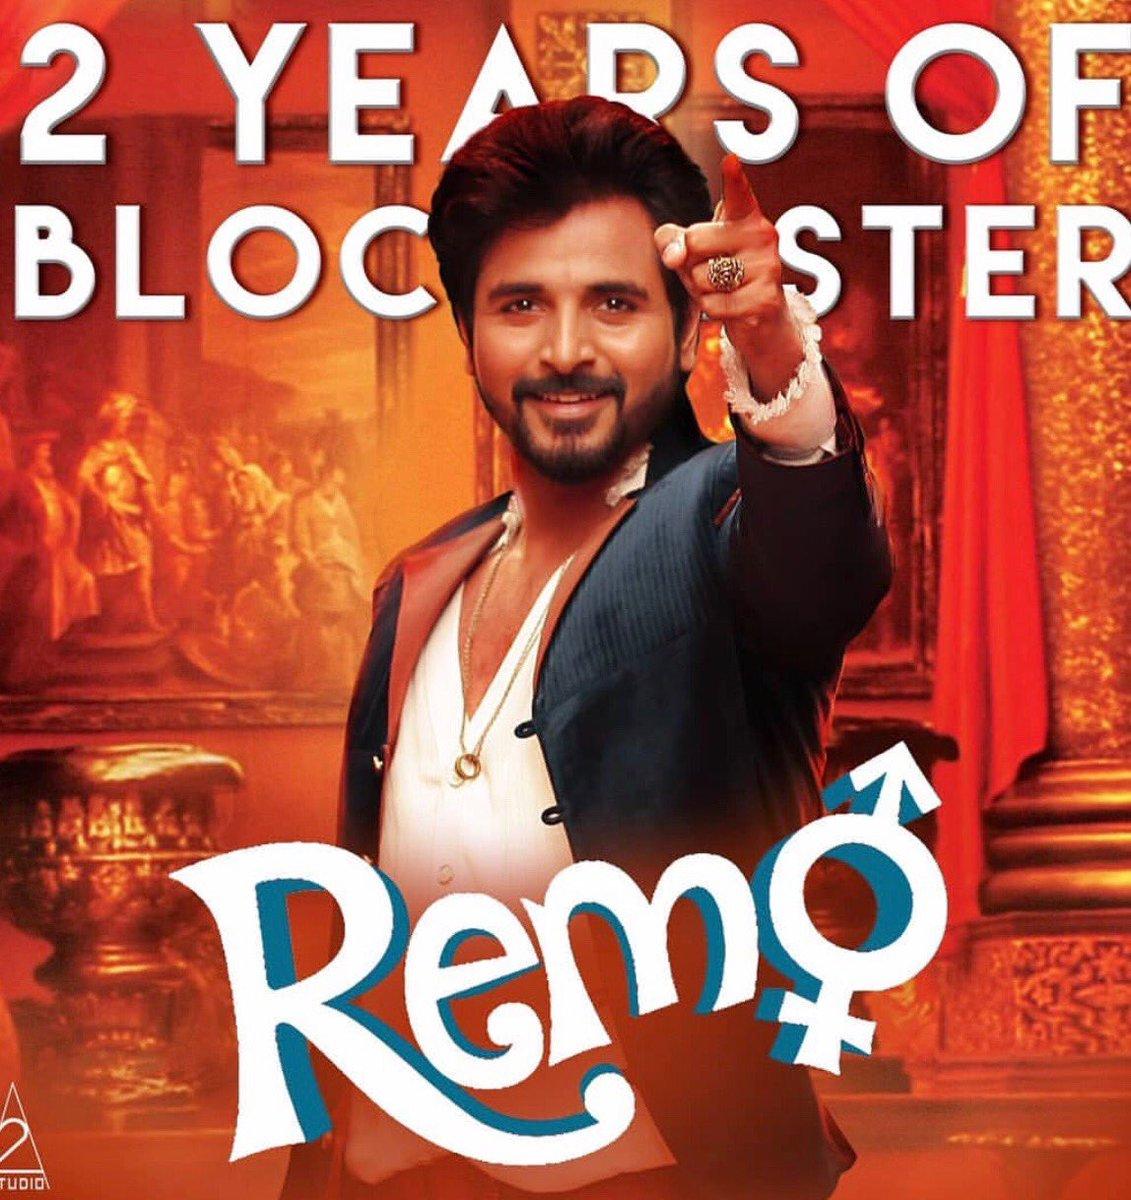 #Remo A memorable journey .